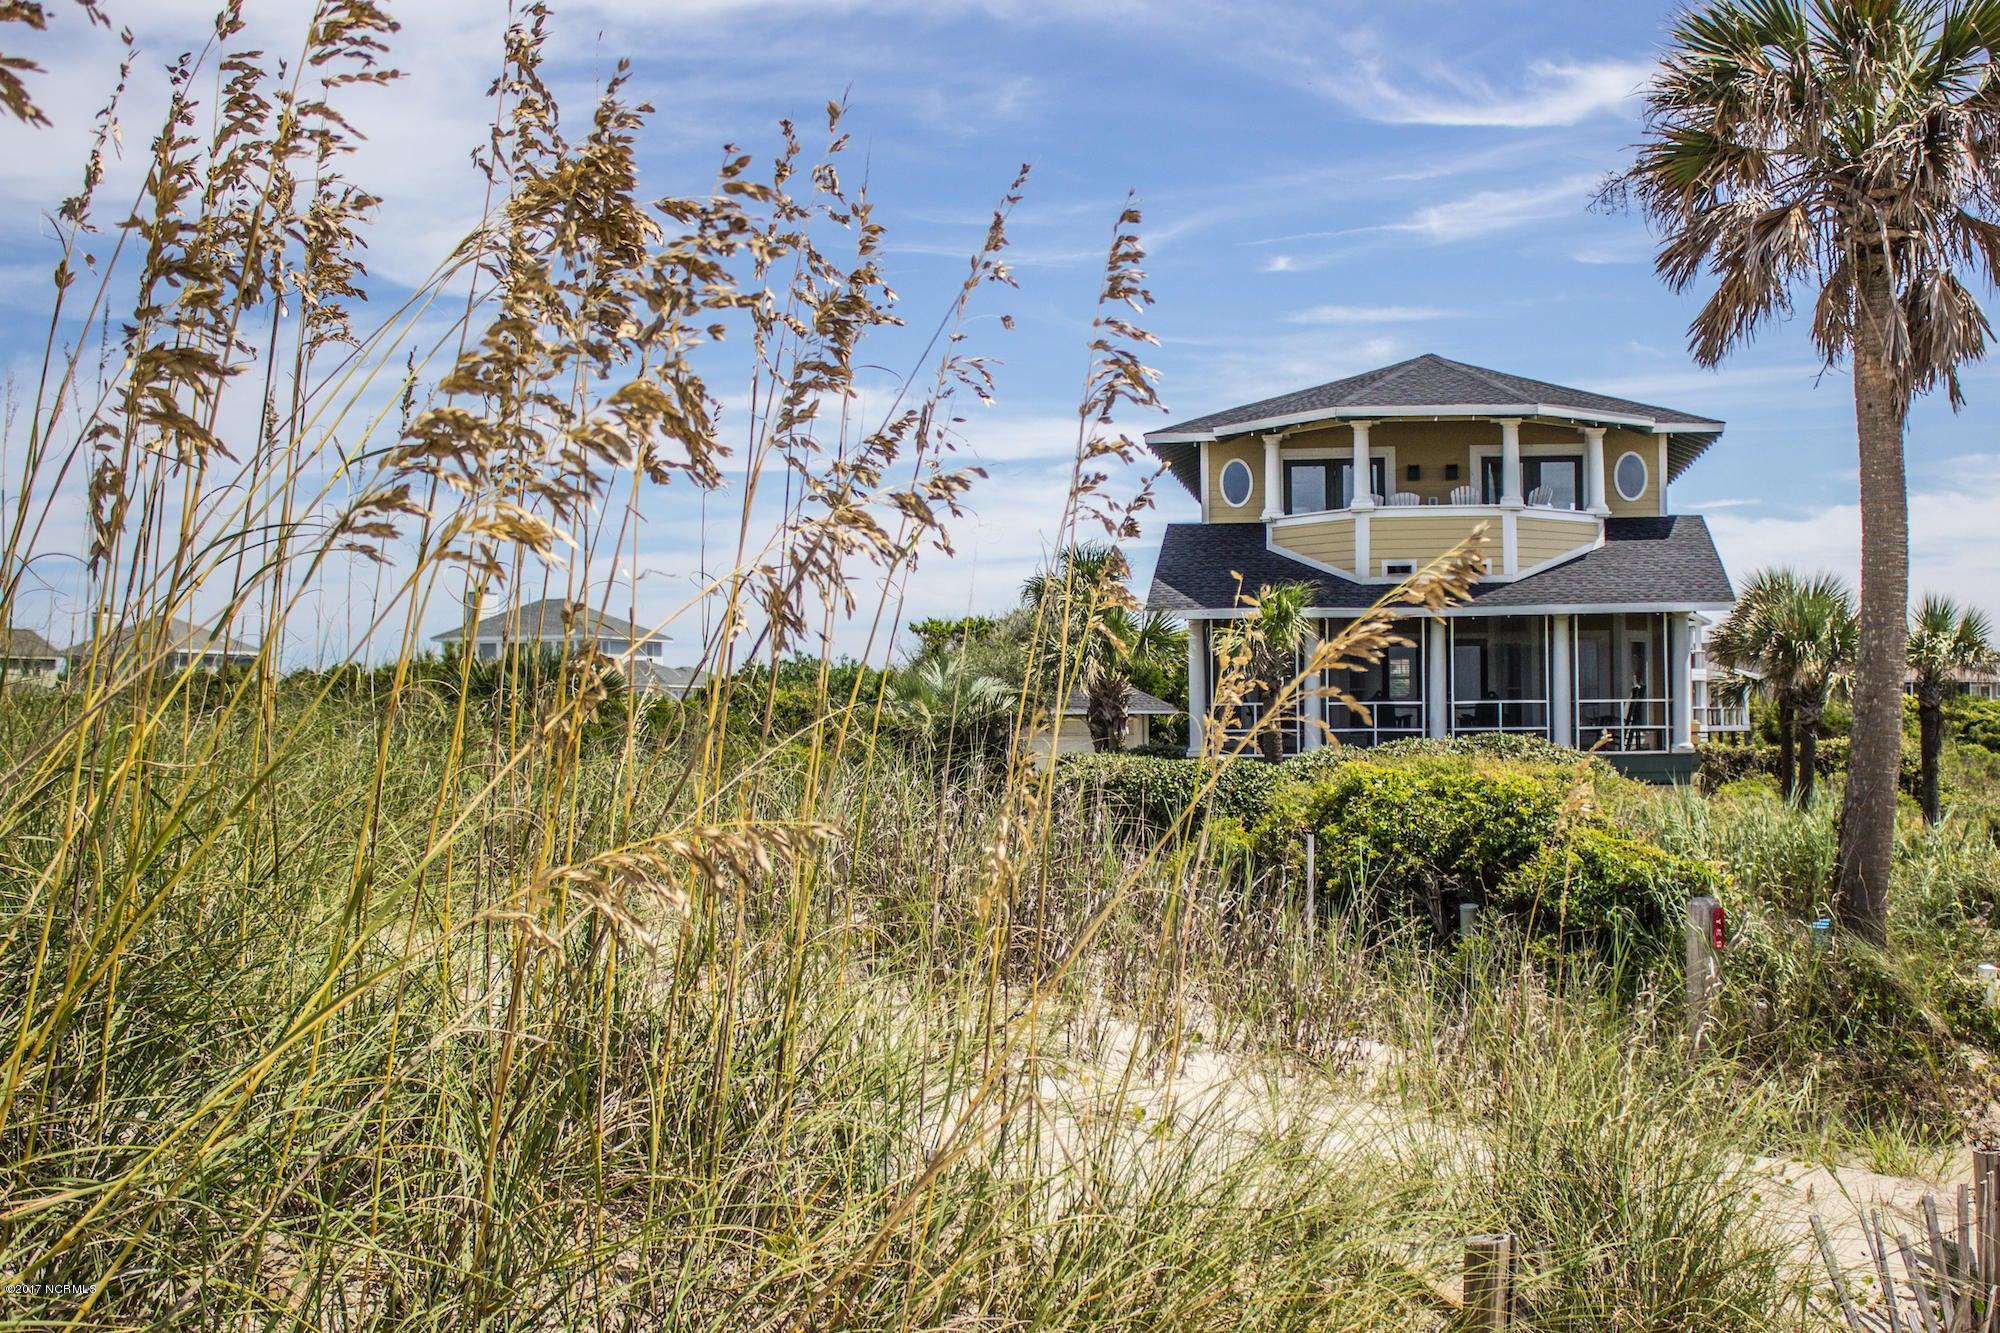 BHI (Bald Head Island) Real Estate - http://cdn.resize.sparkplatform.com/ncr/1024x768/true/20170910192414658328000000-o.jpg